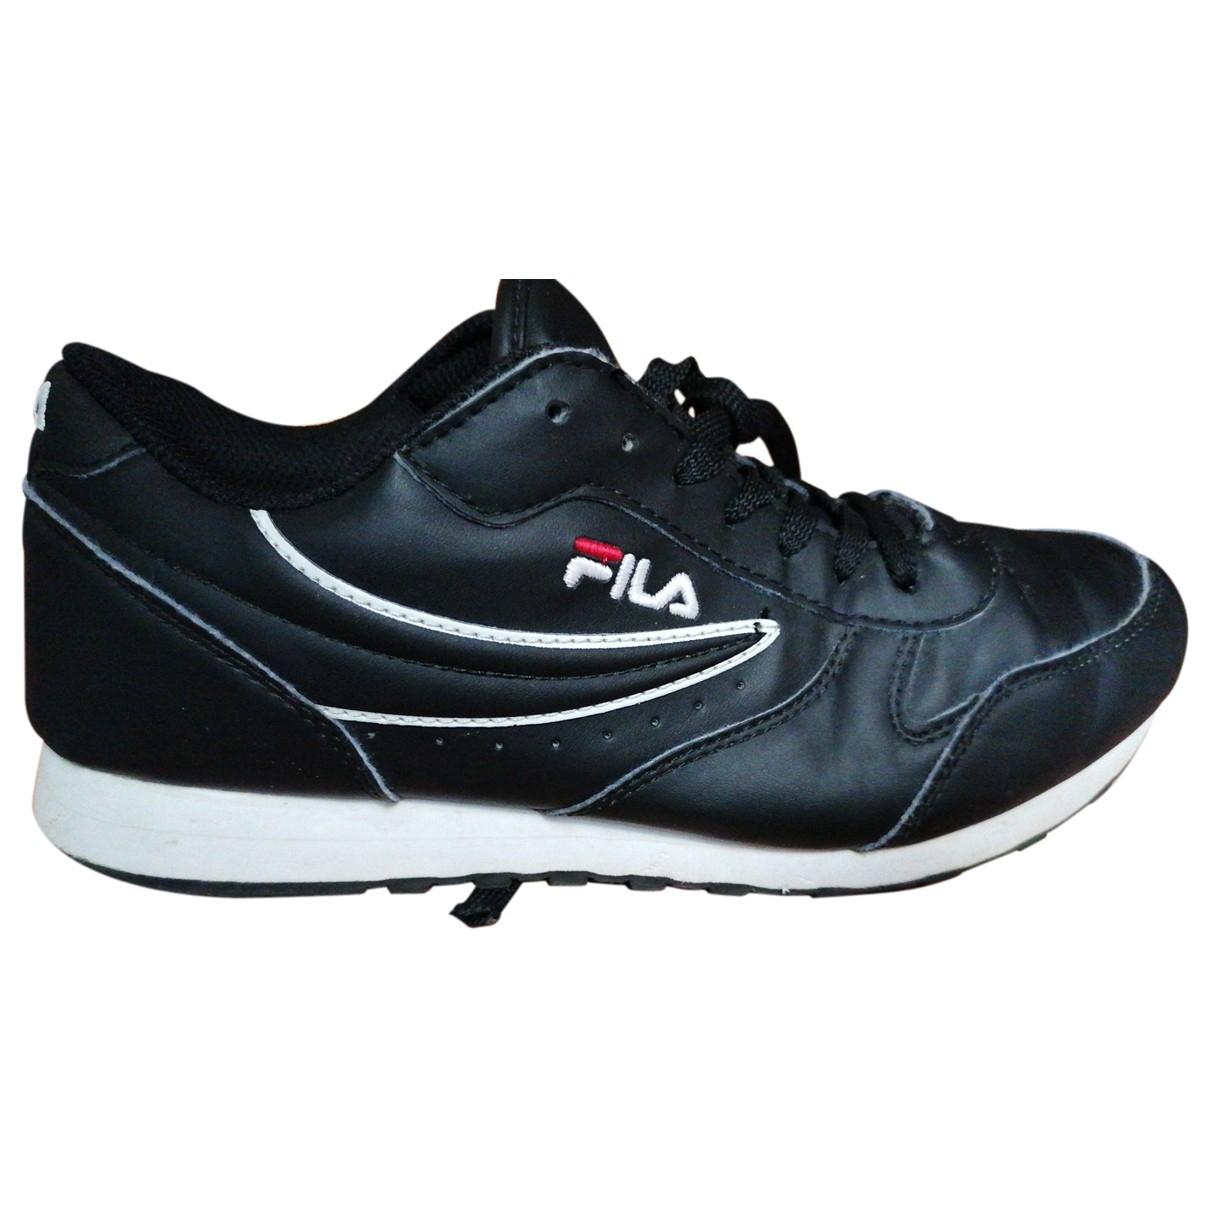 Fila \N Black Leather Trainers for Women 40 EU